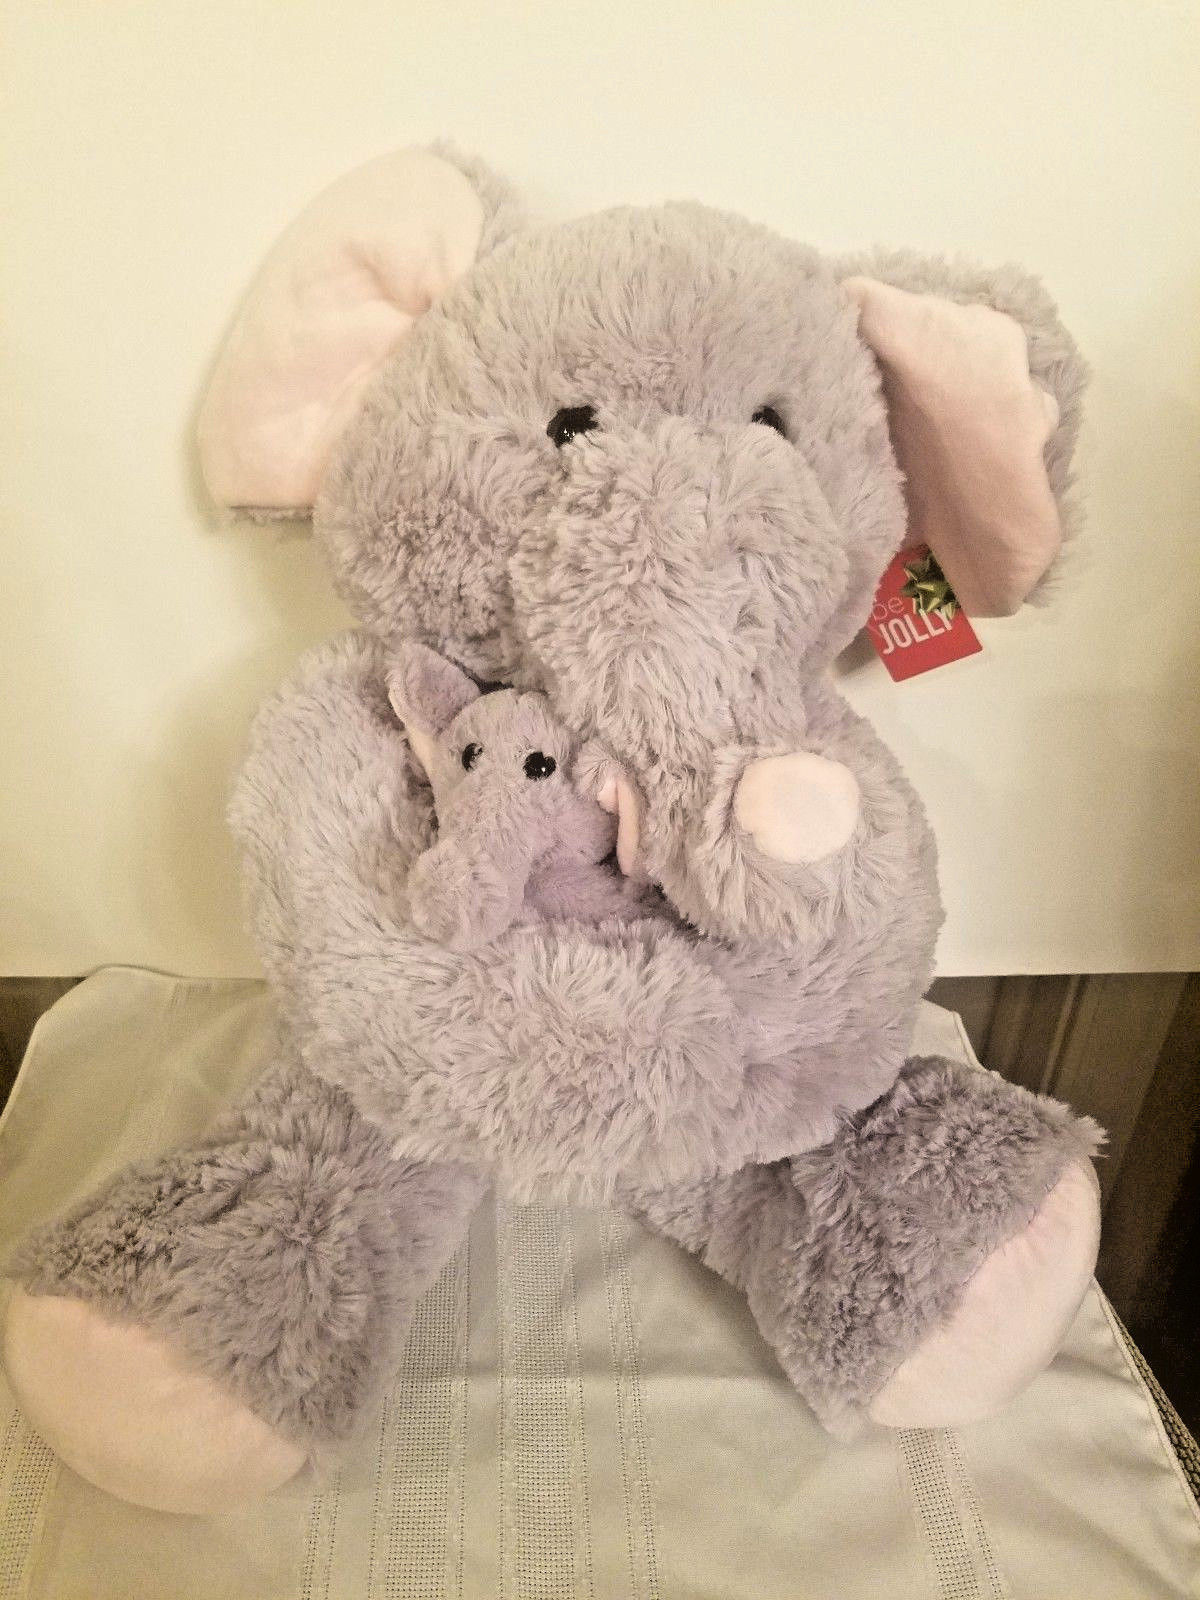 Blue Big Teddy Bear, Hugfun 19 Jumbo Plush Elephant And Baby And 50 Similar Items